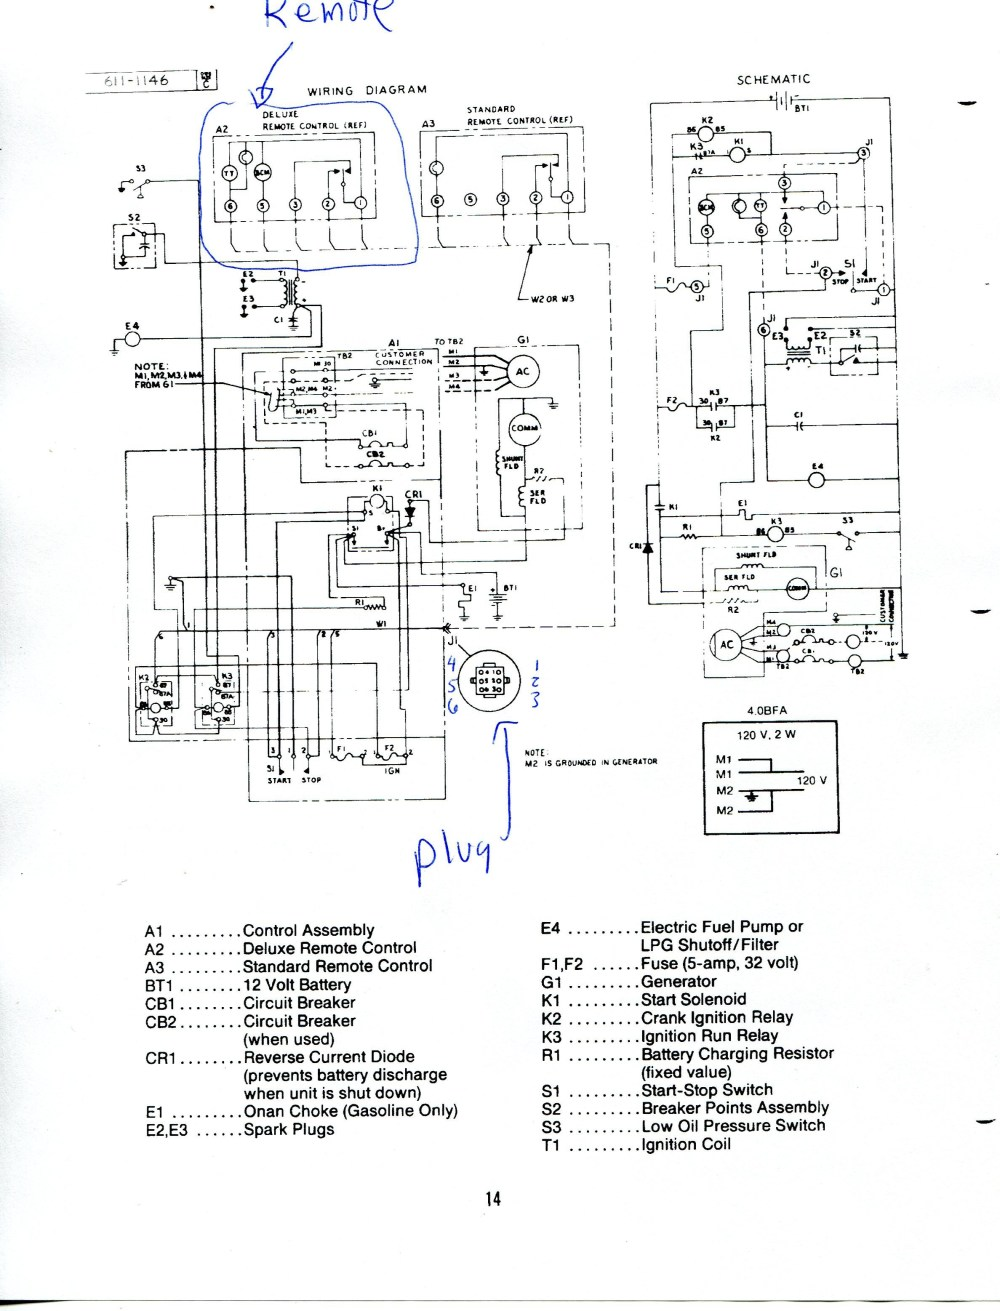 medium resolution of wiring diagram an generator valid luxury an generator electric choke circuit gift simple wiring